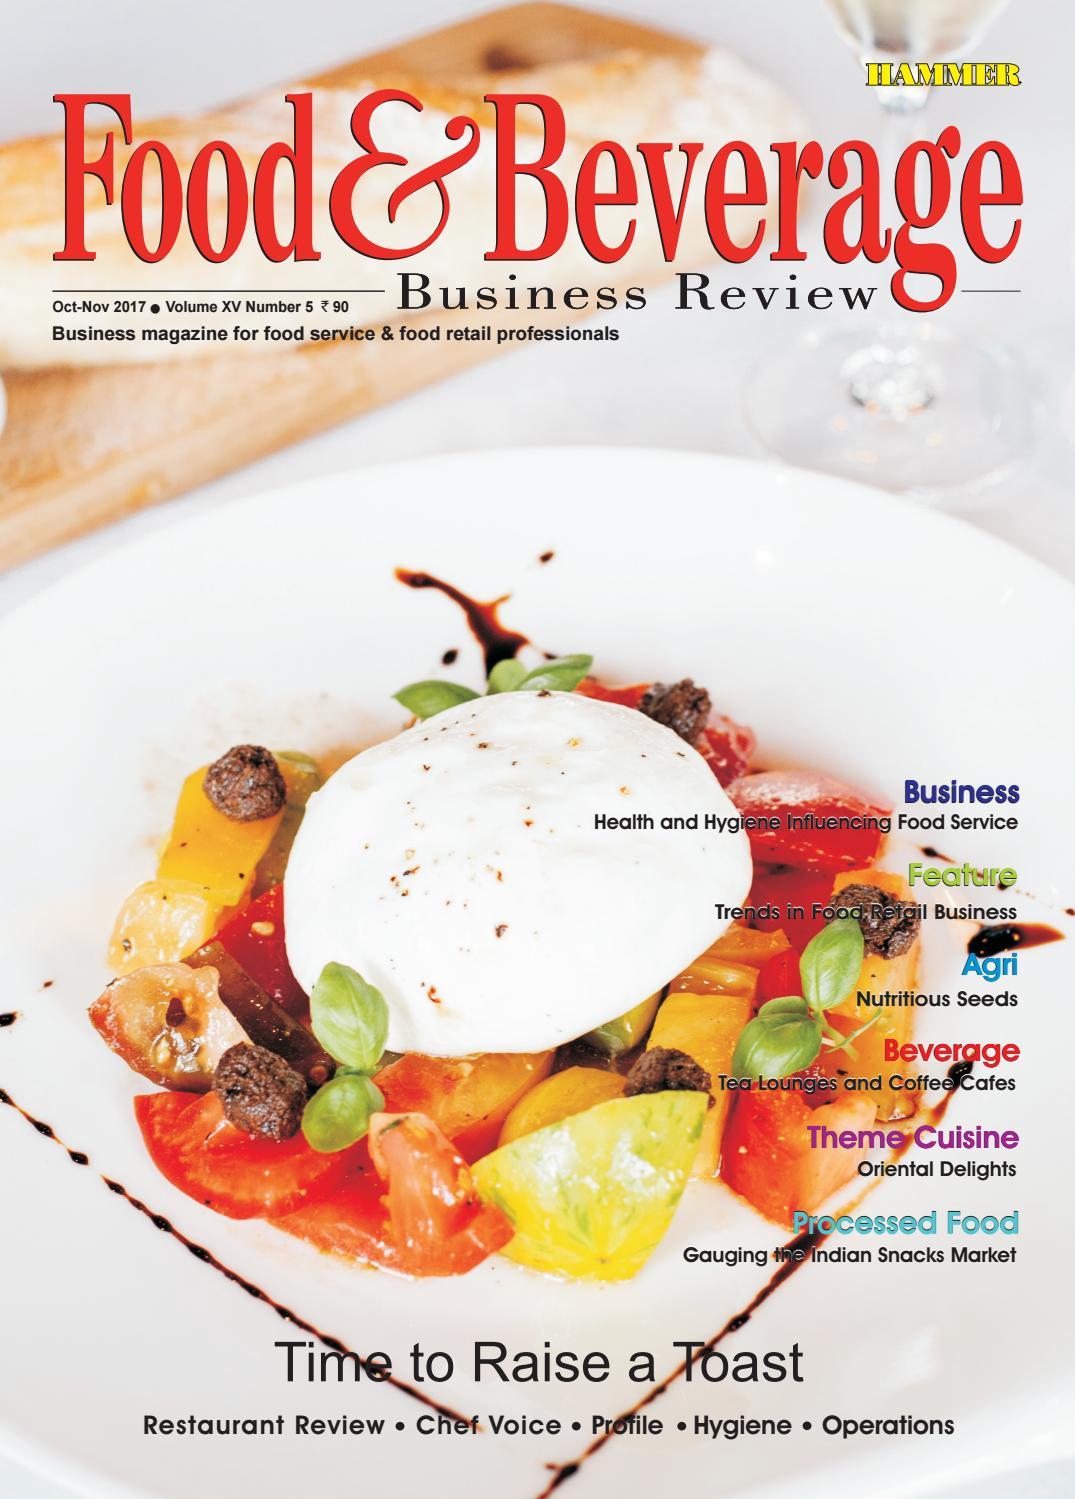 Food Beverage Business Review Oct Nov  By Food Beverage